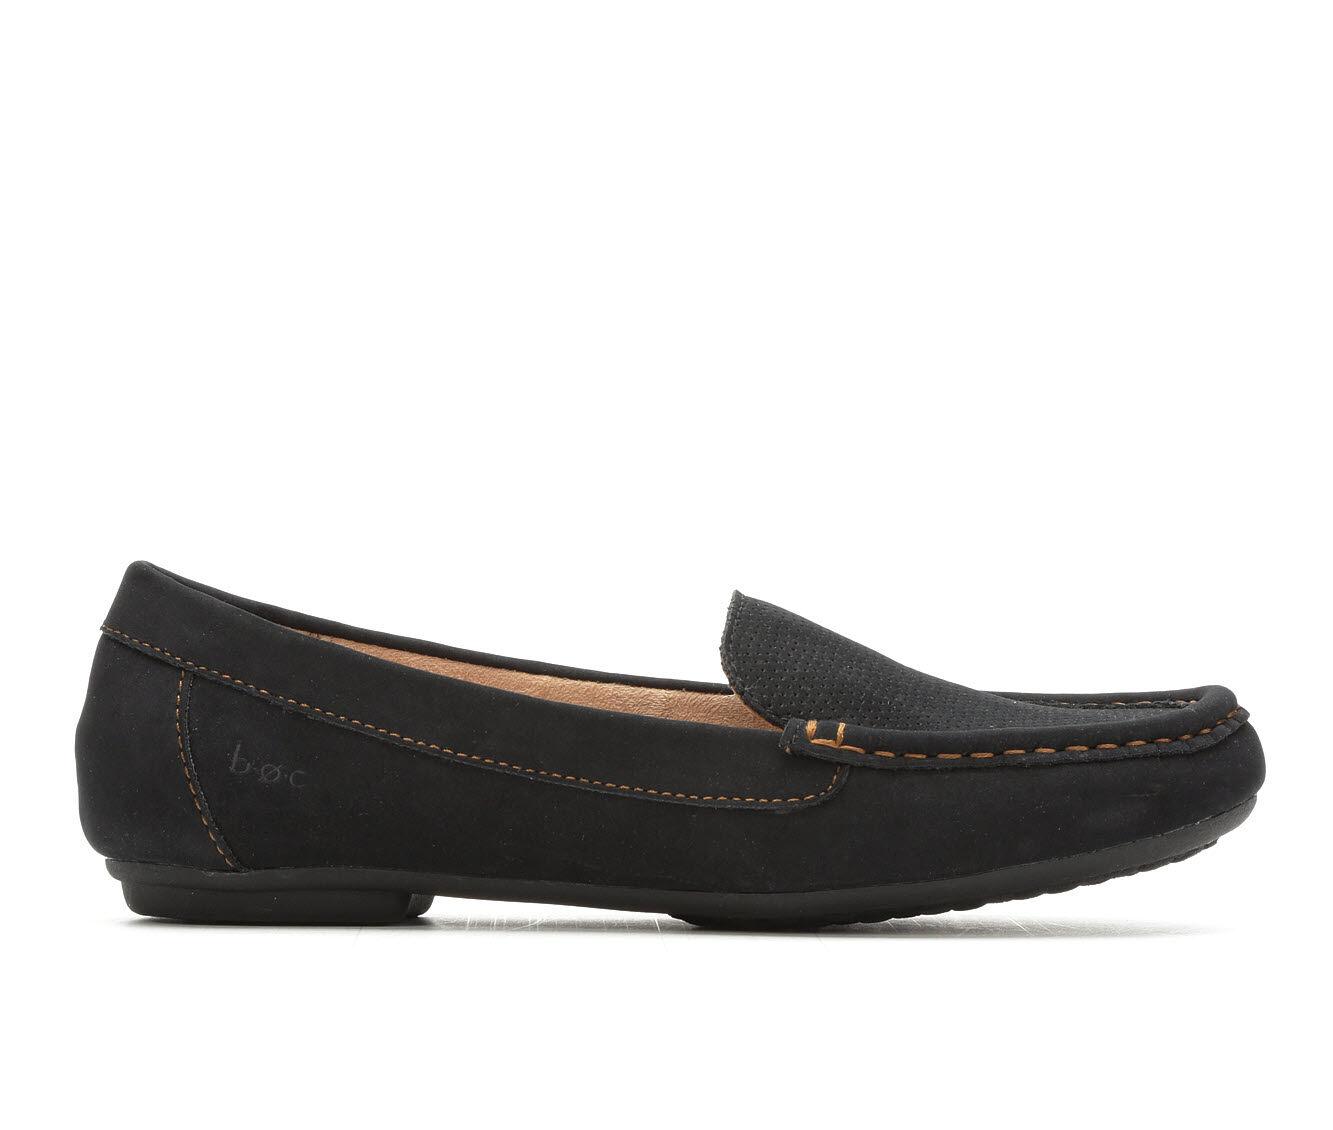 Women's B.O.C. Carolee Loafers Black